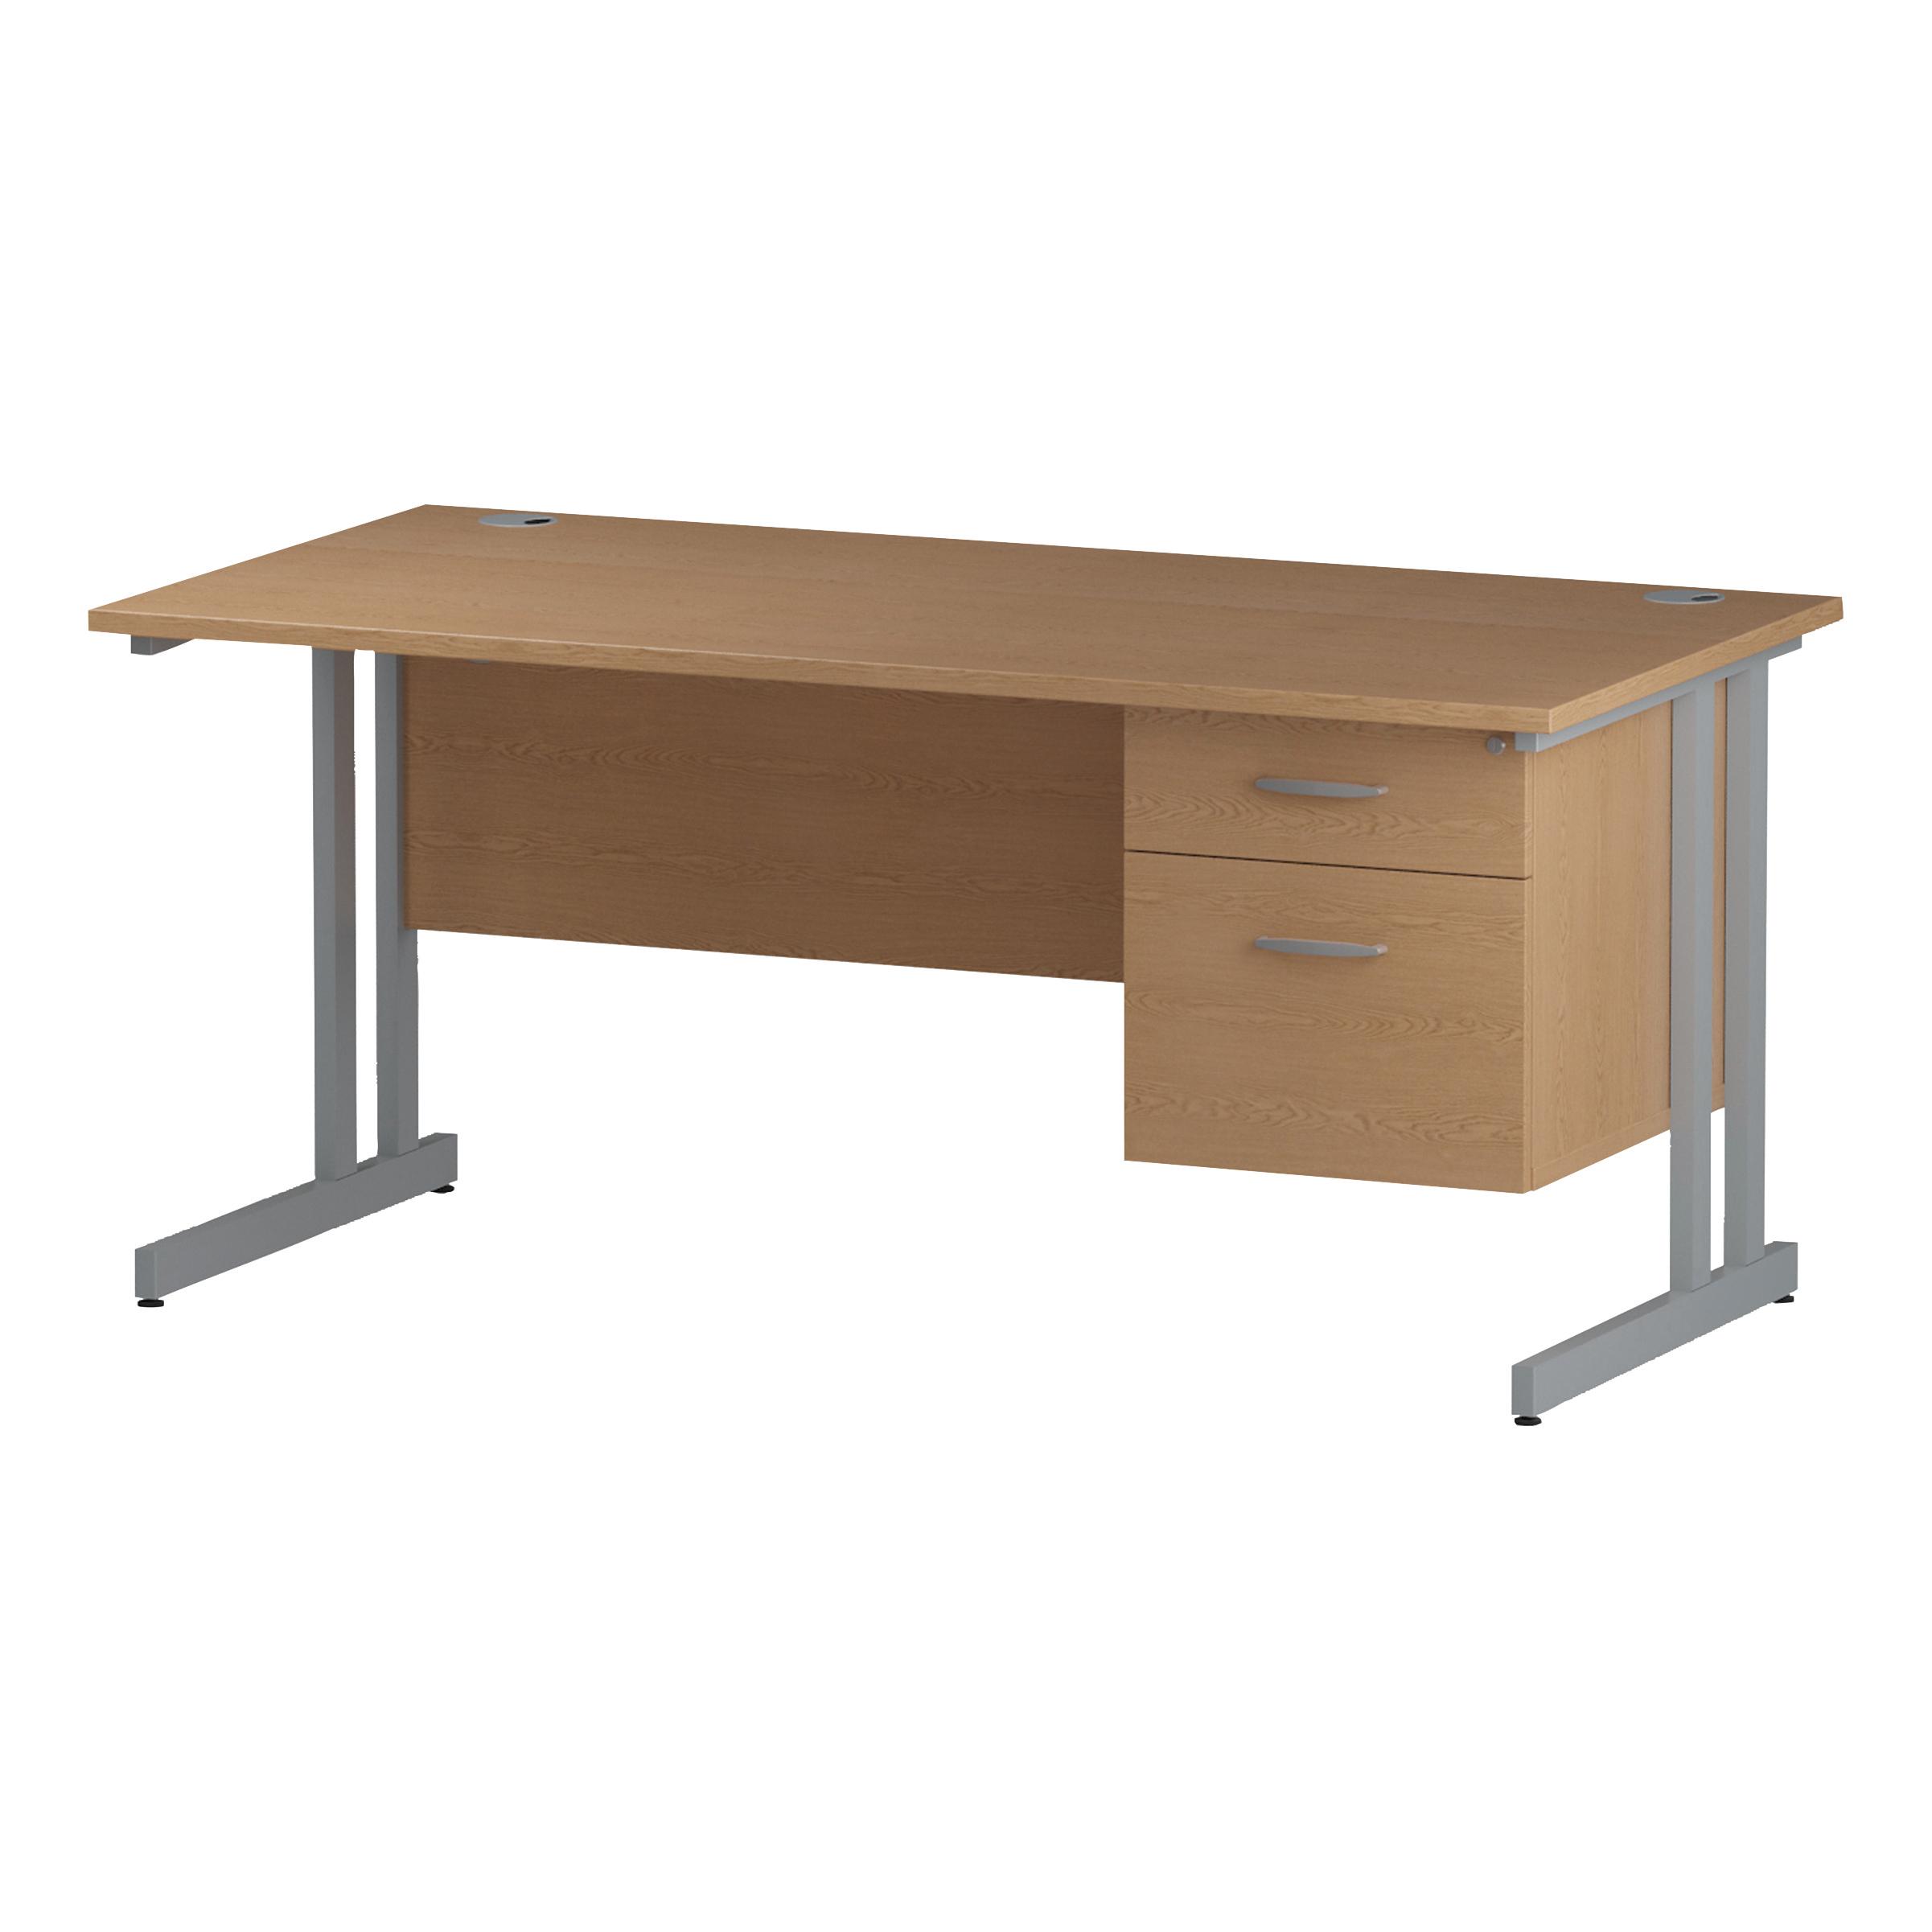 Trexus Rectangular Desk Silver Cantilever Leg 1600x800mm Fixed Pedestal 2 Drawers Oak Ref I002659